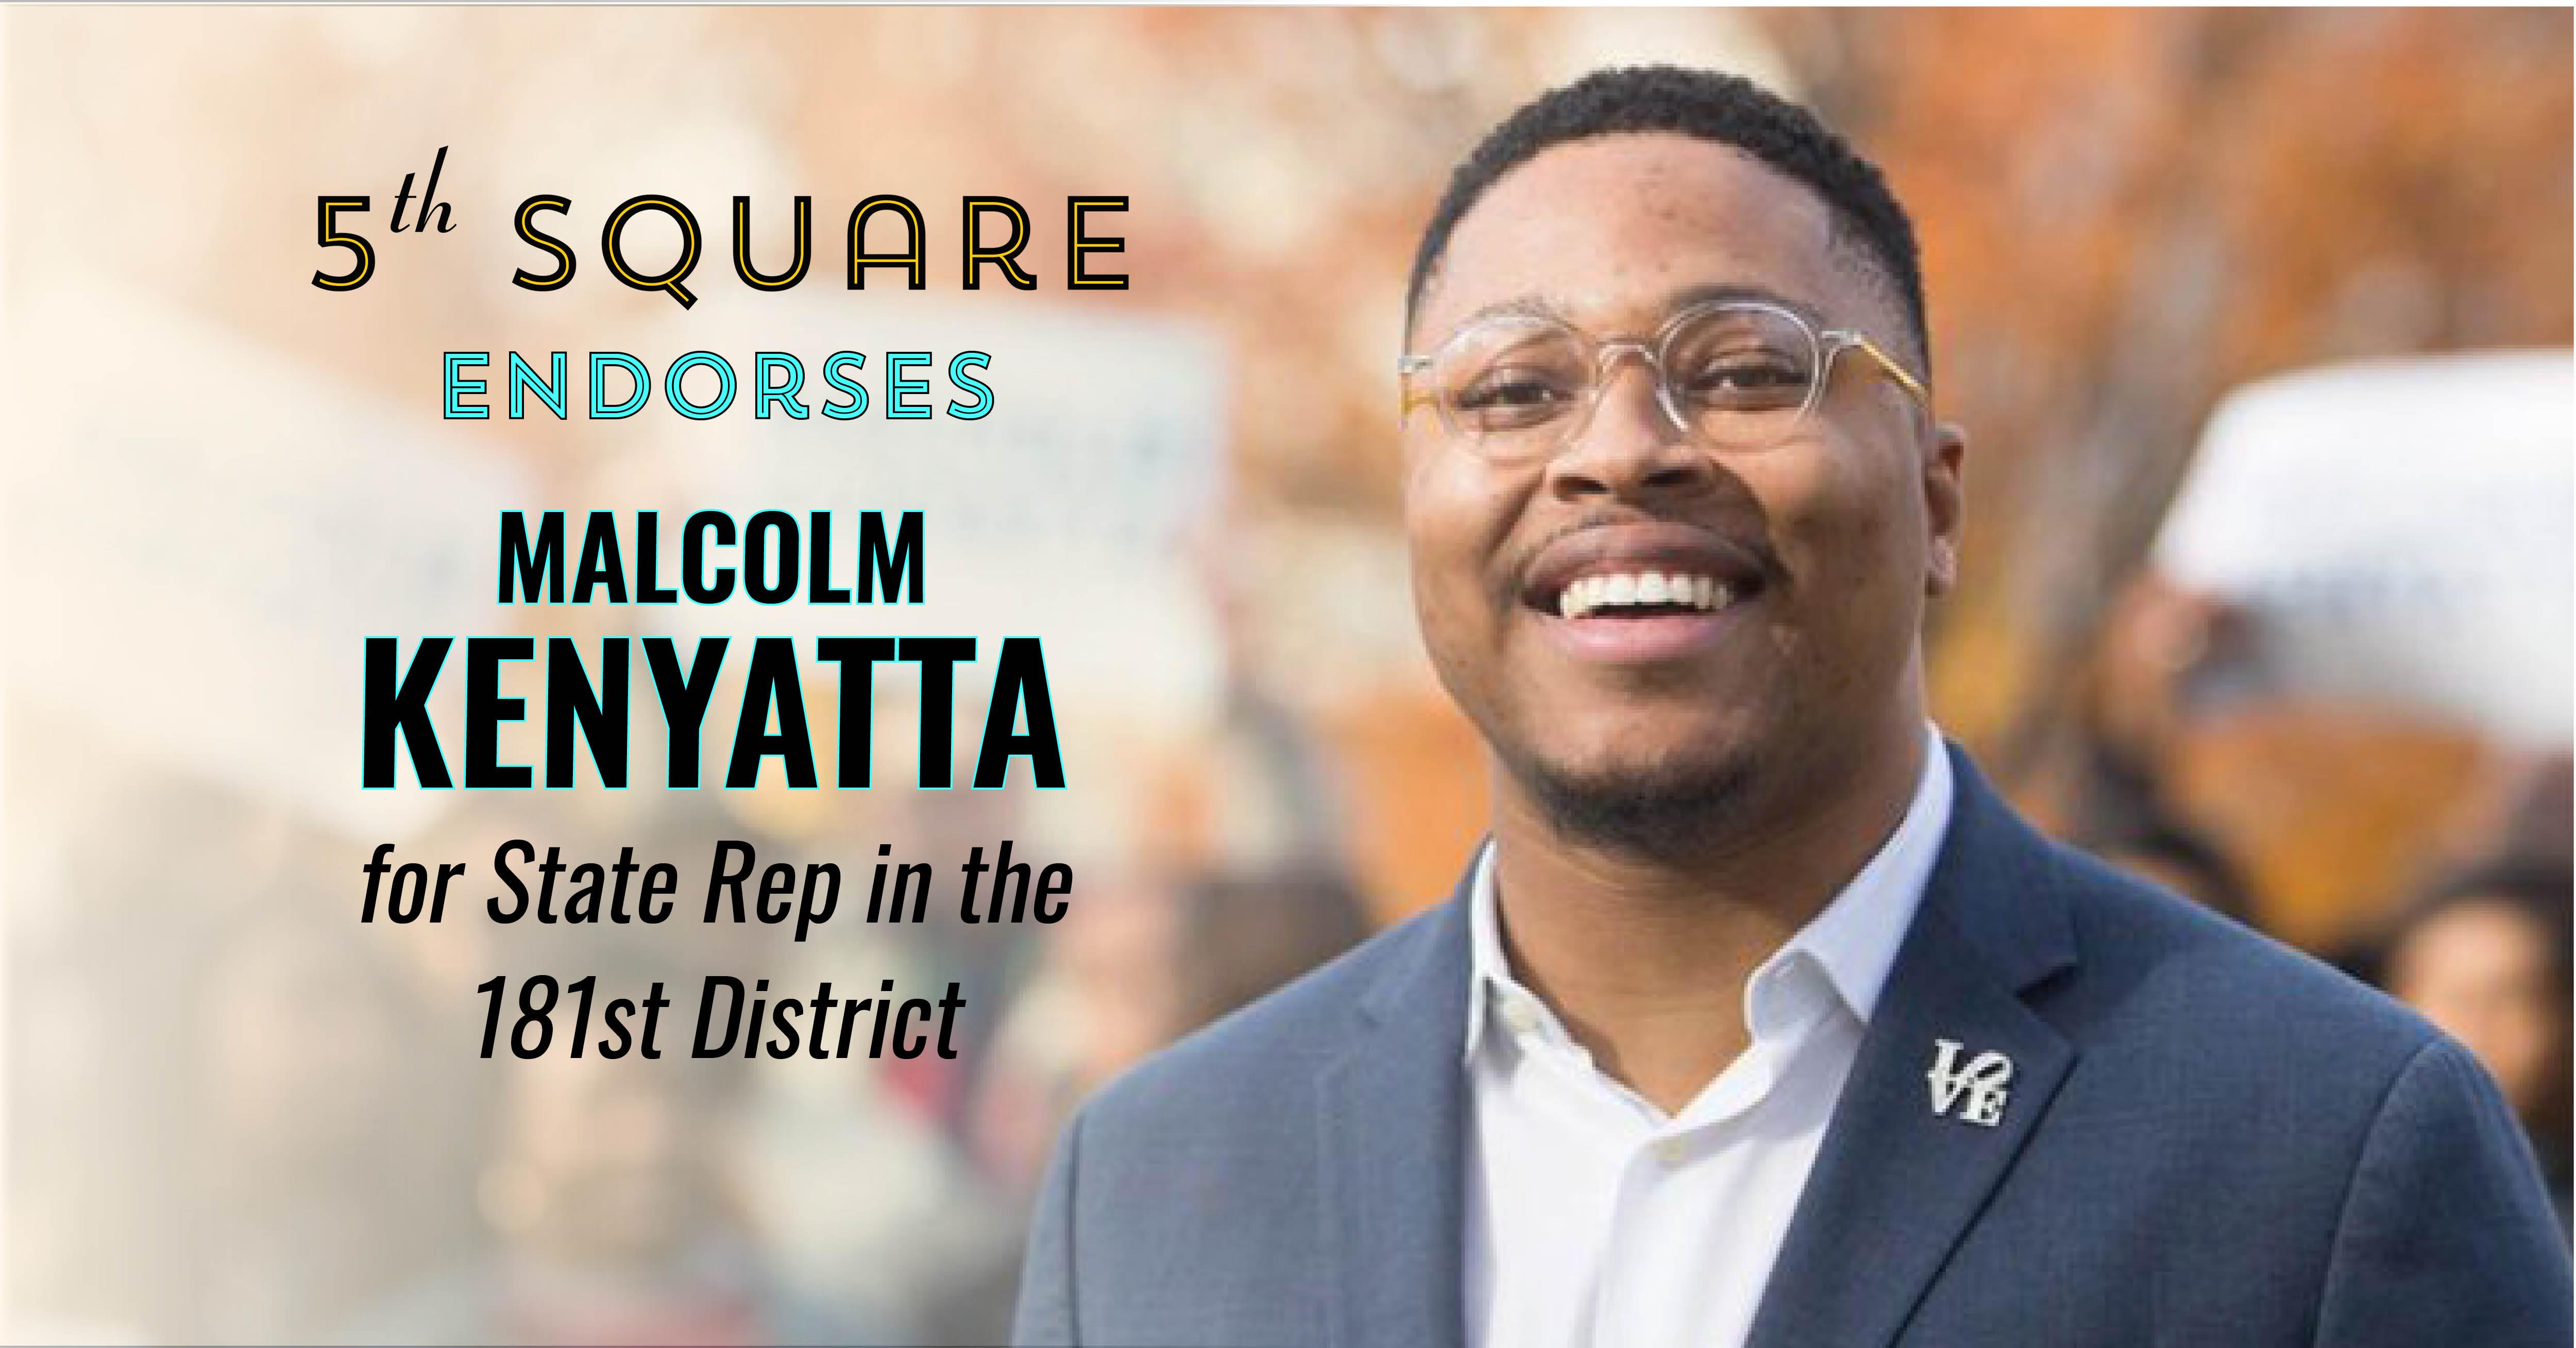 GOTV and Voter Reg Canvass for Malcolm Kenyatta! - 5th Square